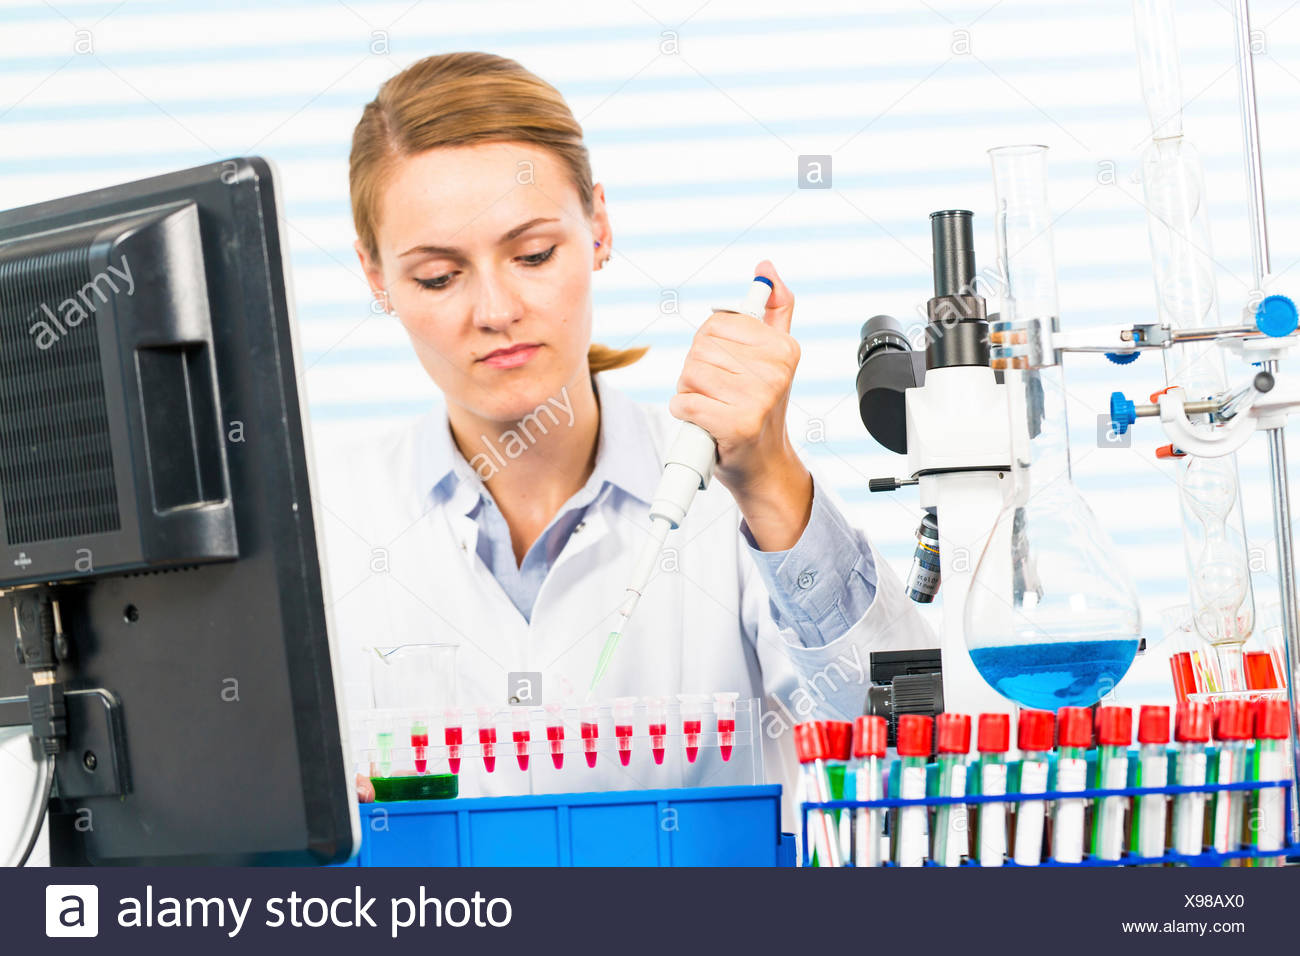 MODEL RELEASED. Female chemist using pipette in laboratory. - Stock Image